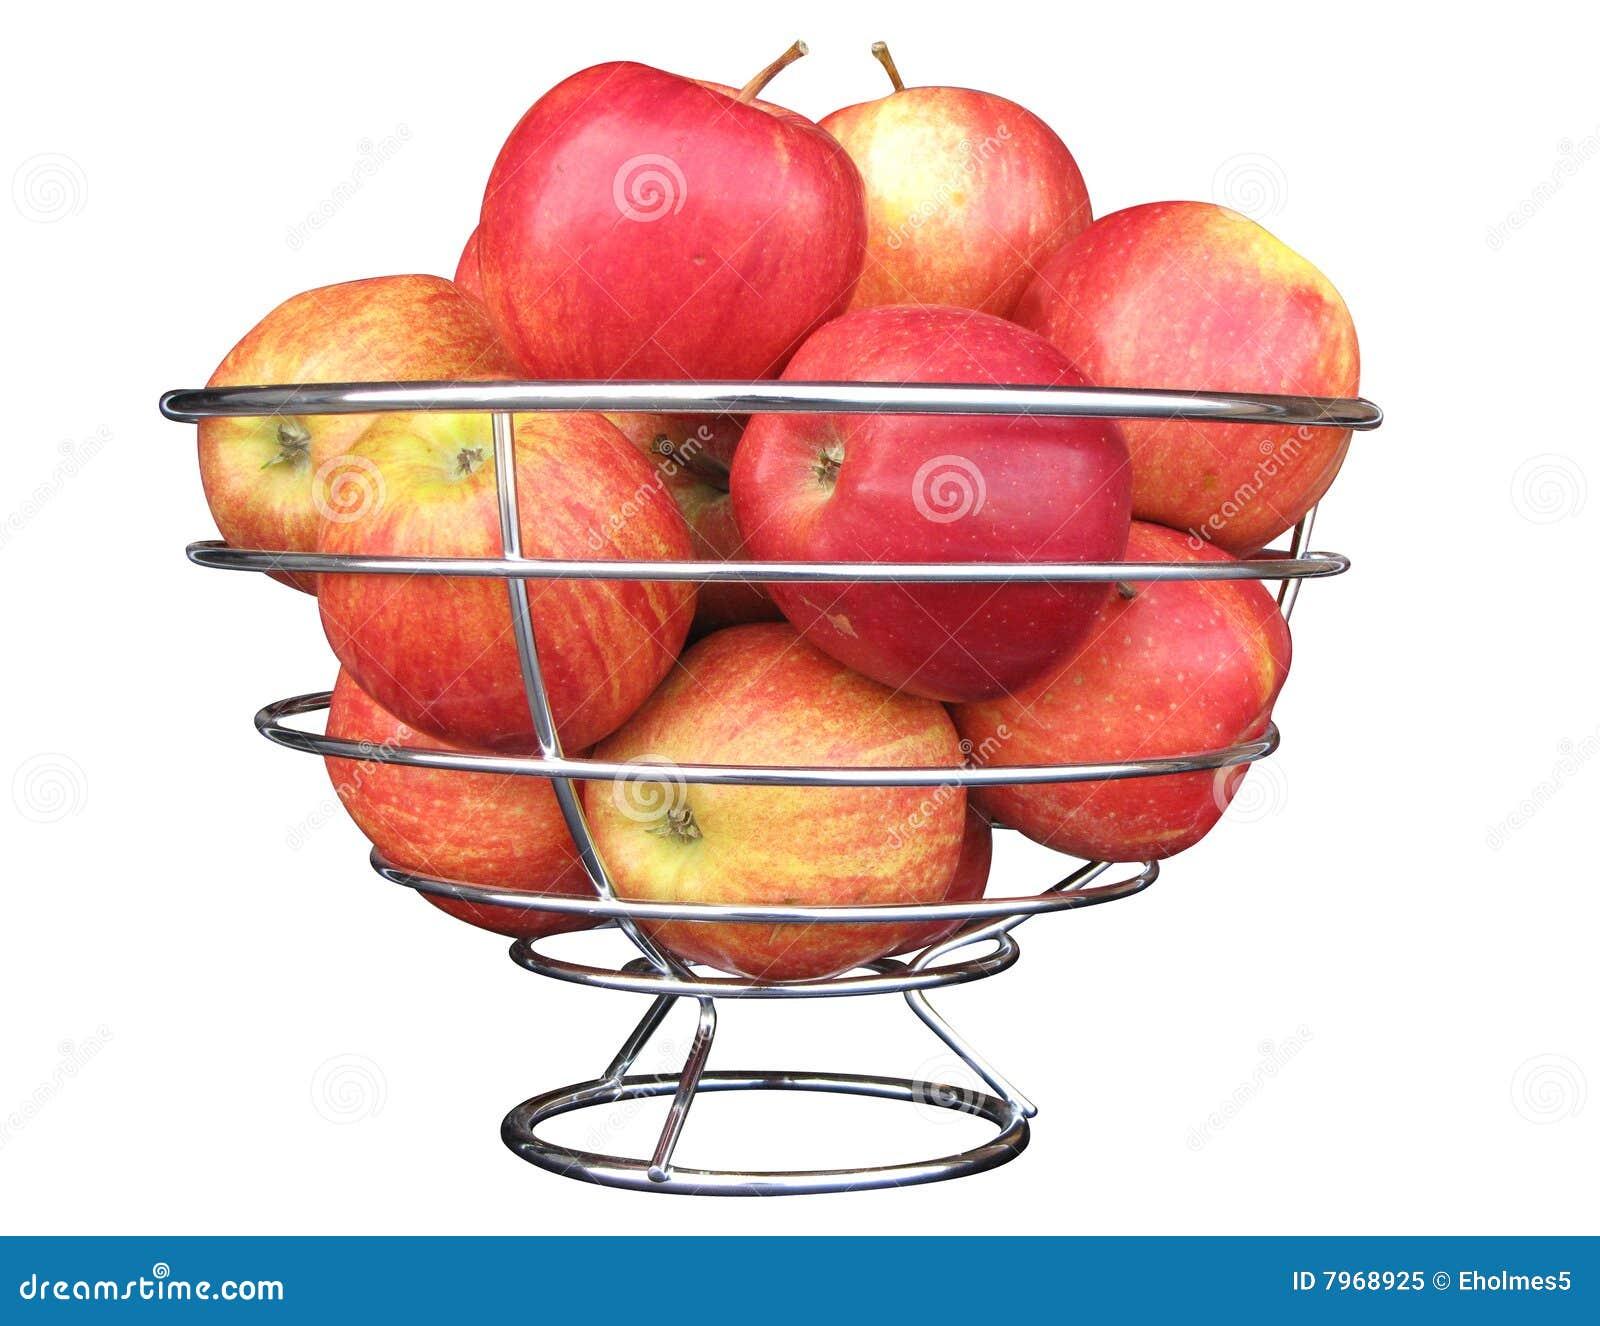 Bowl of apples stock image. Image of bowl, fruit, kitchen ...